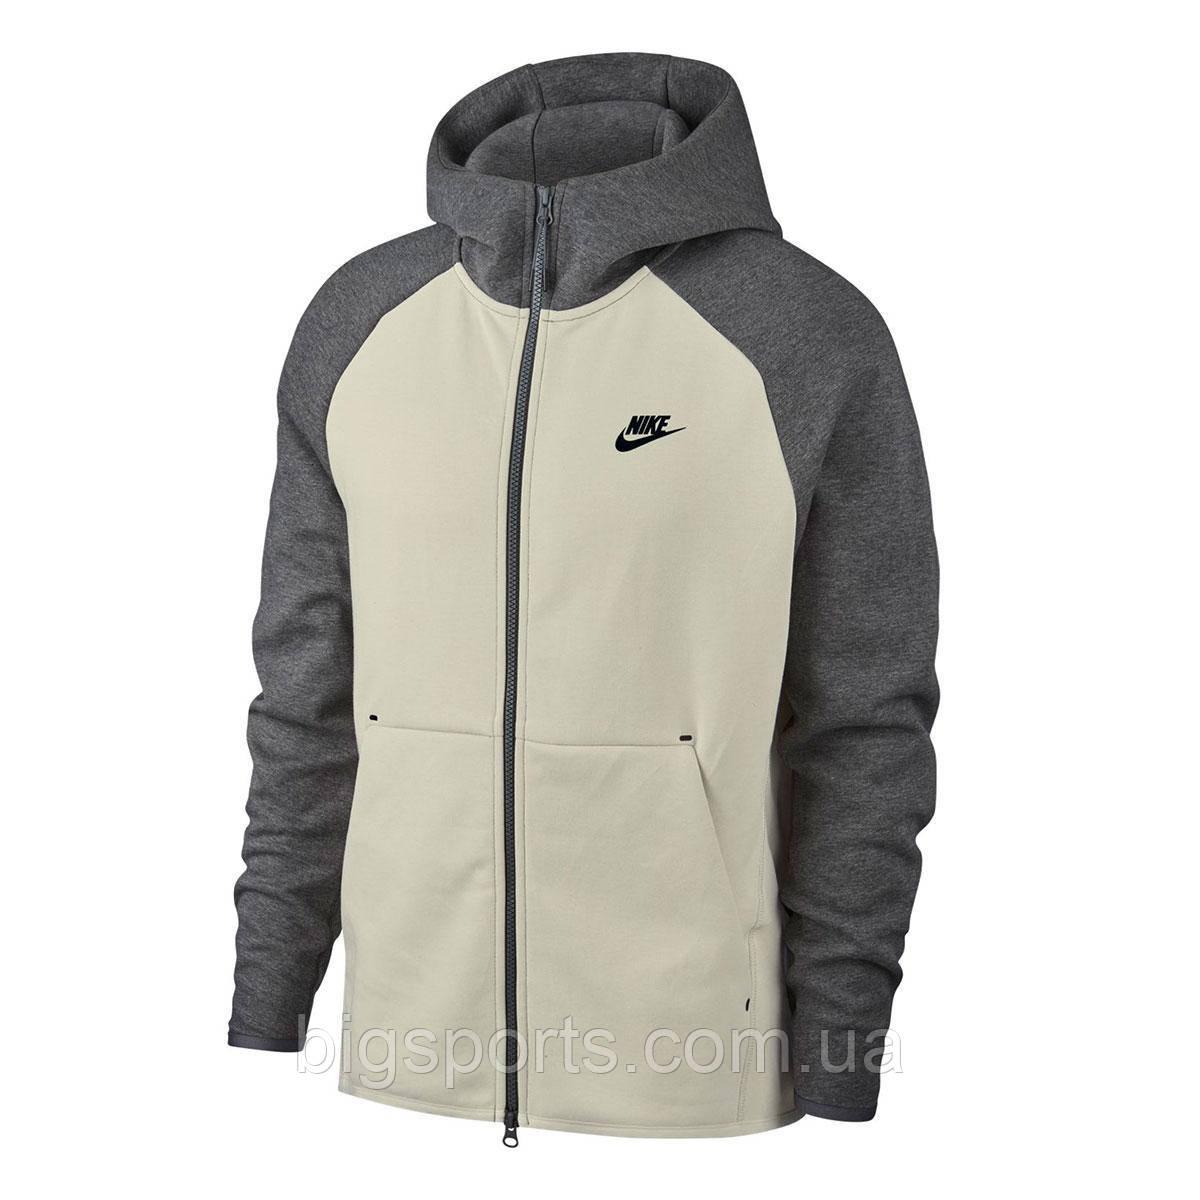 92da1720 Кофта муж. Nike M Nsw Tch Flc Hoodie Fz (арт. 928483-072): продажа ...